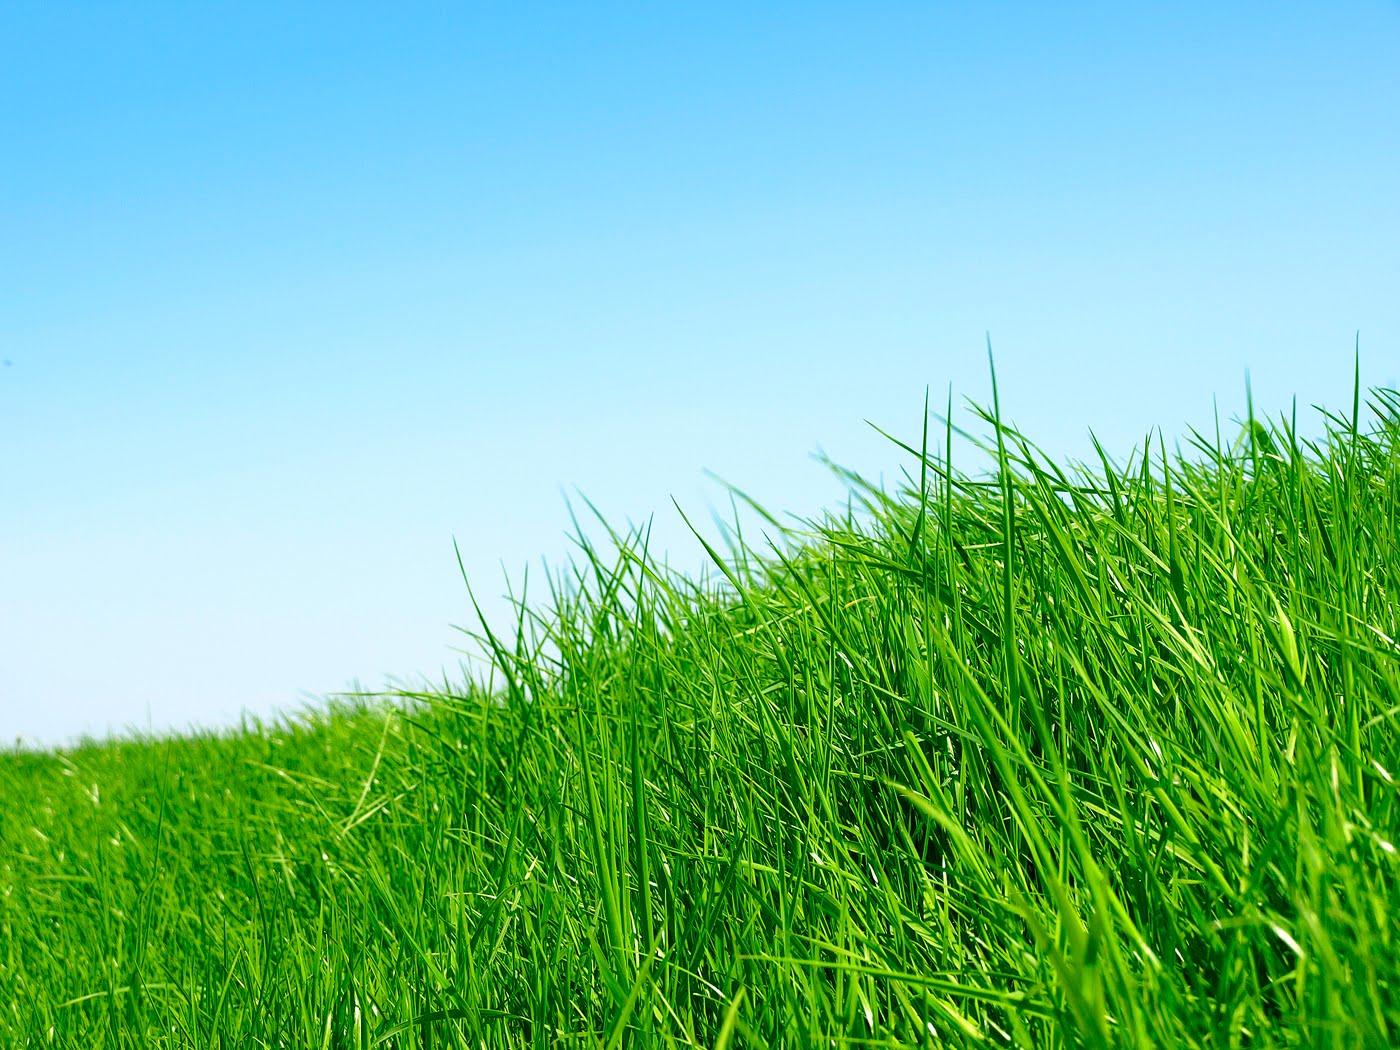 Grass Wallpapers - Wallpapers HD